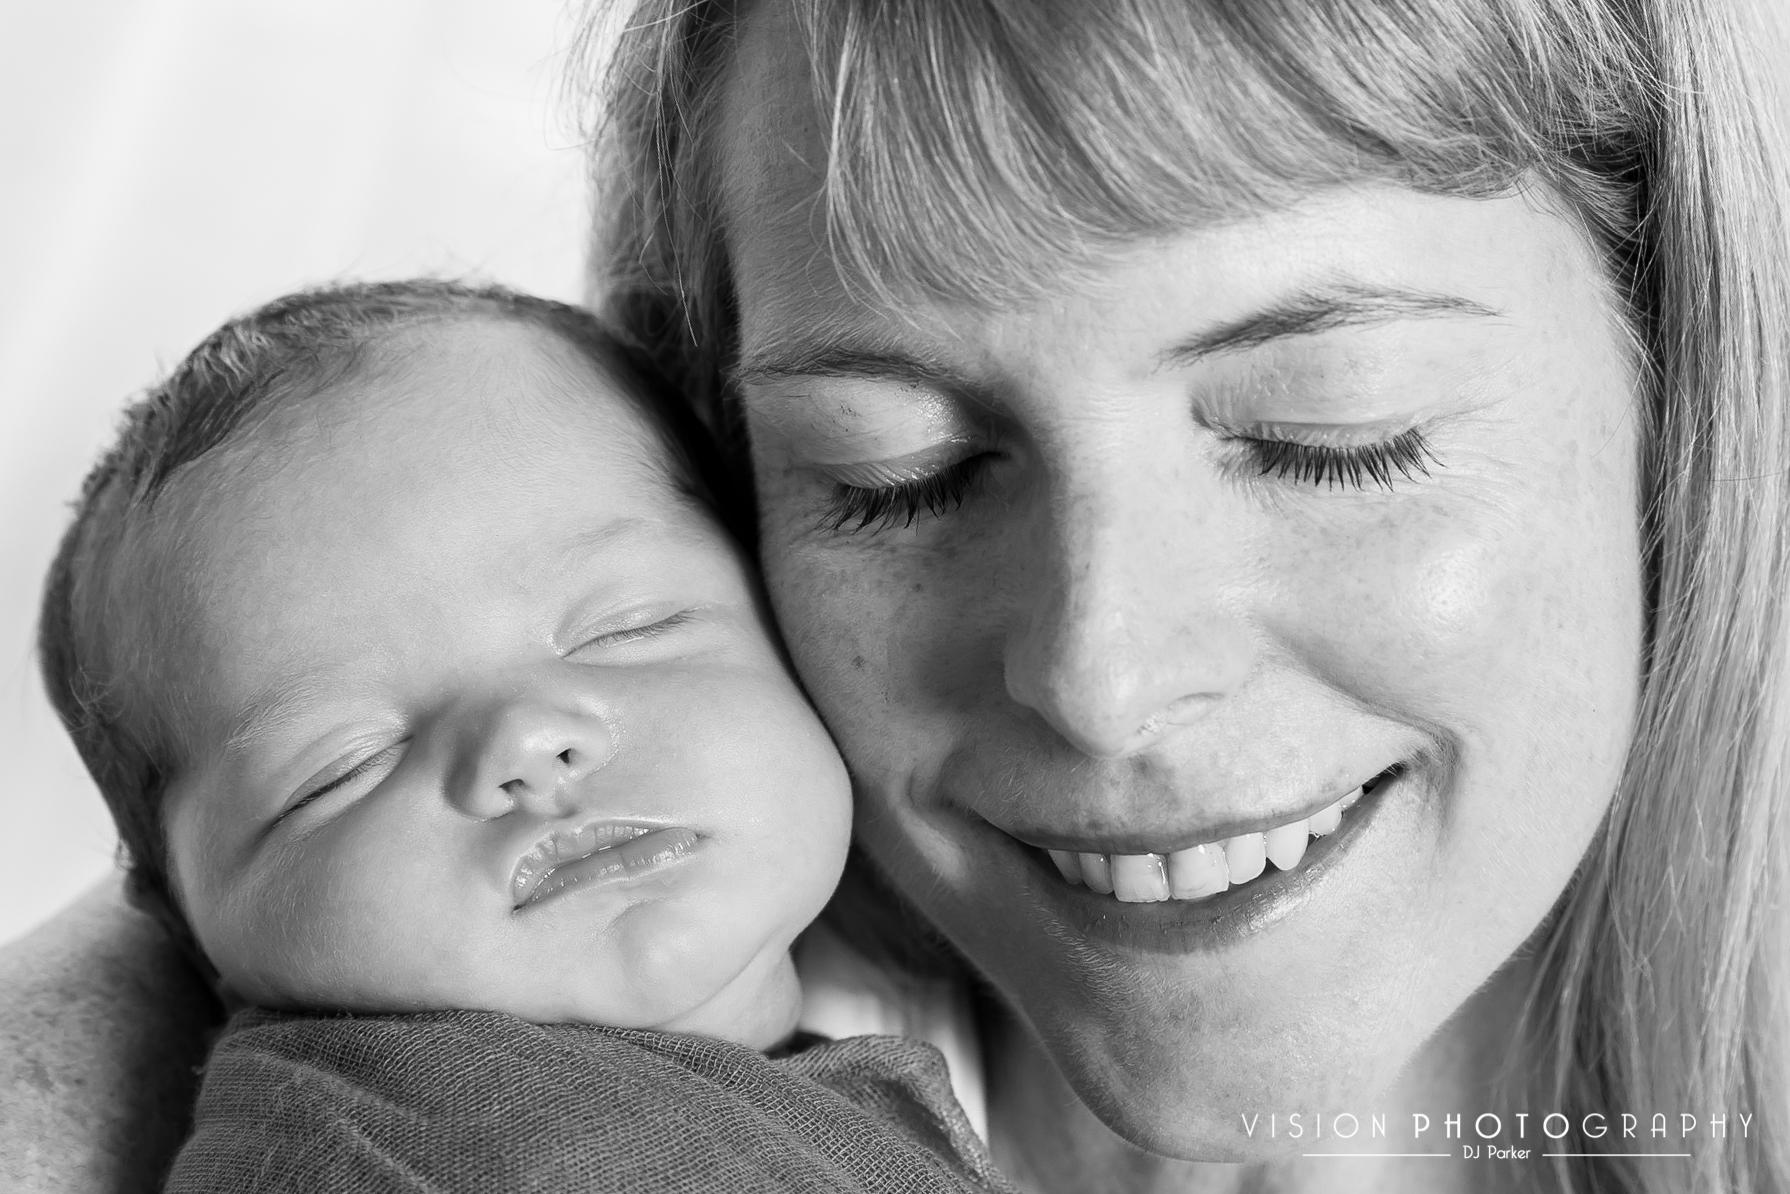 Newborn studio photography white background